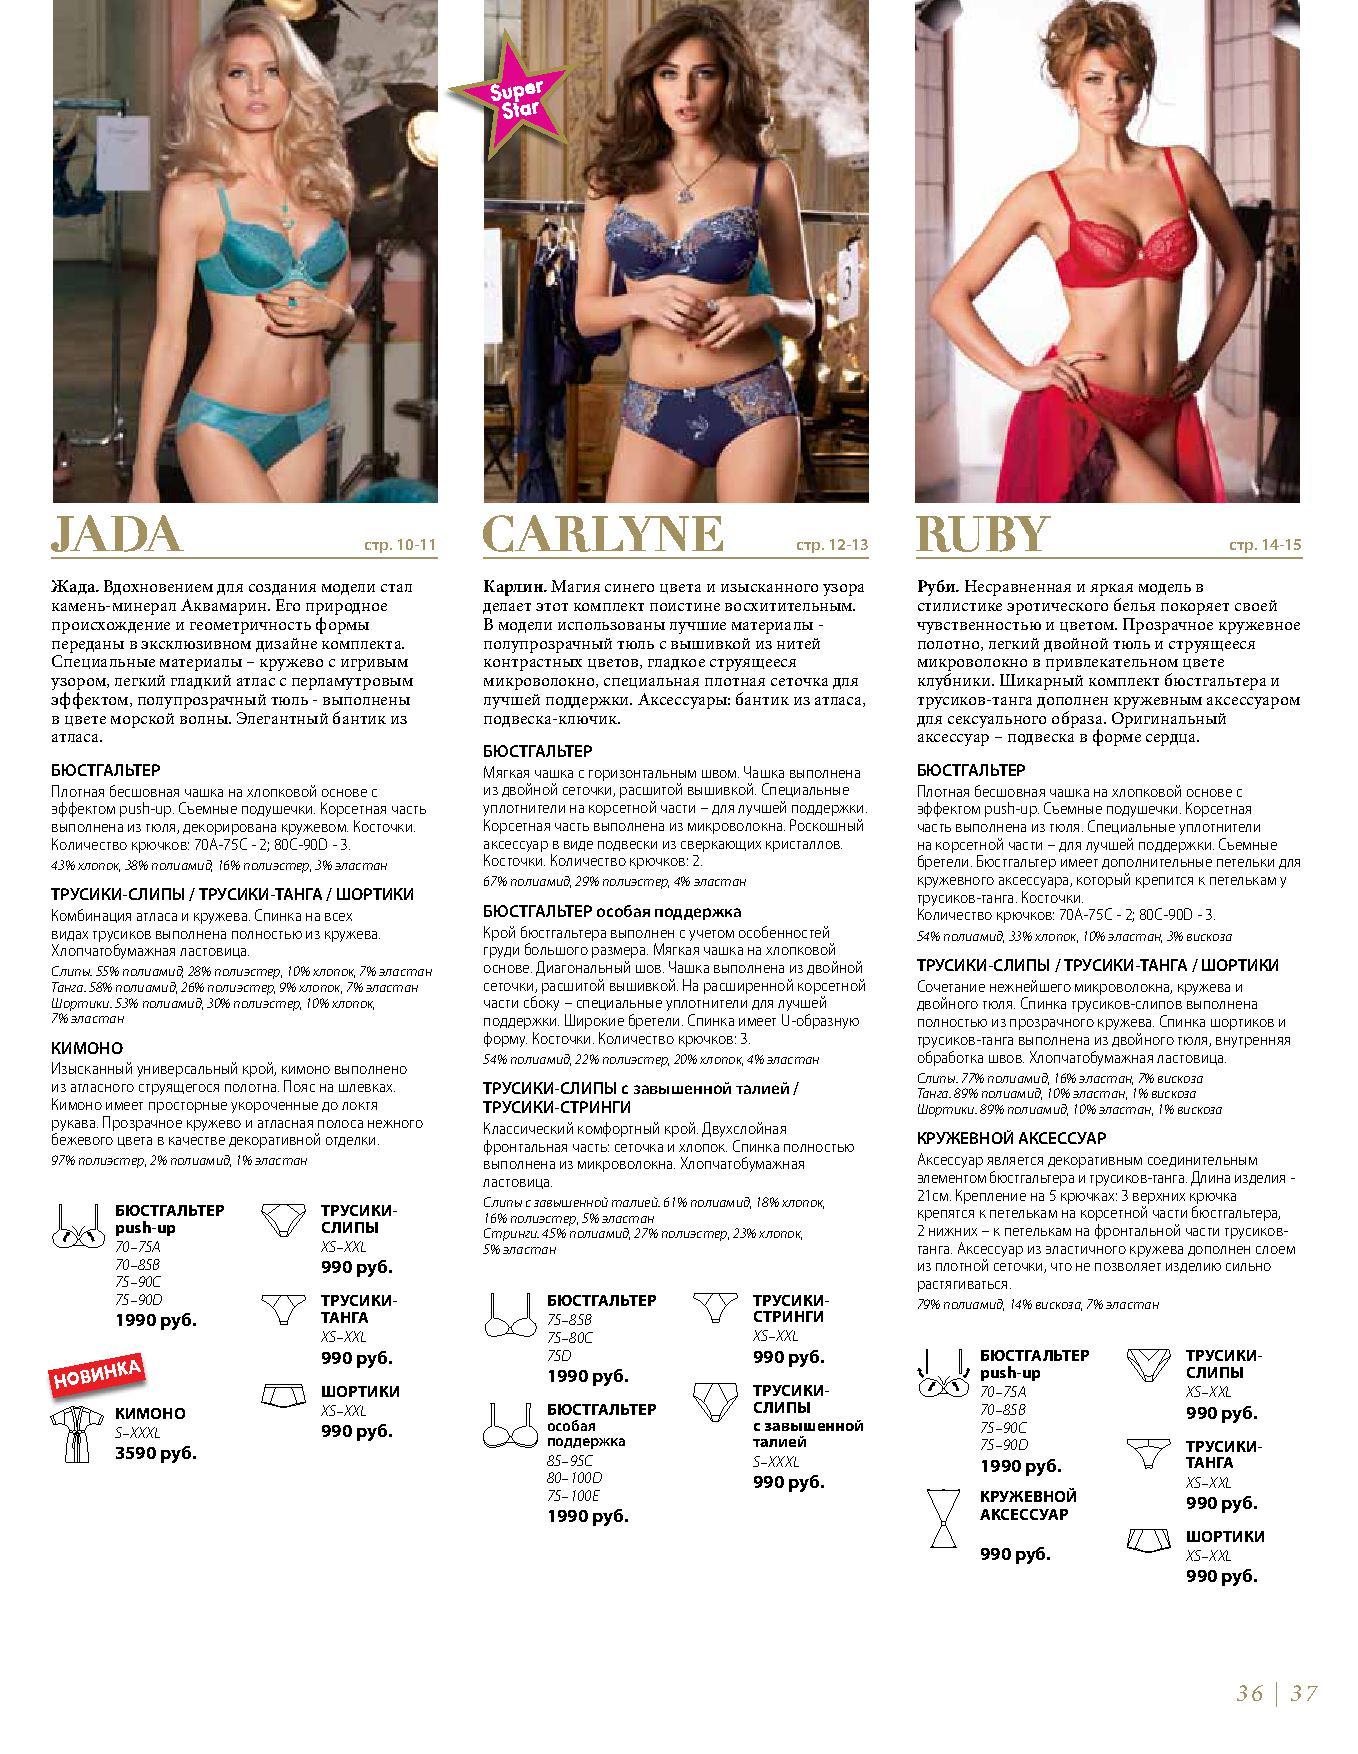 Описание комплектов каталога стр. 10-15